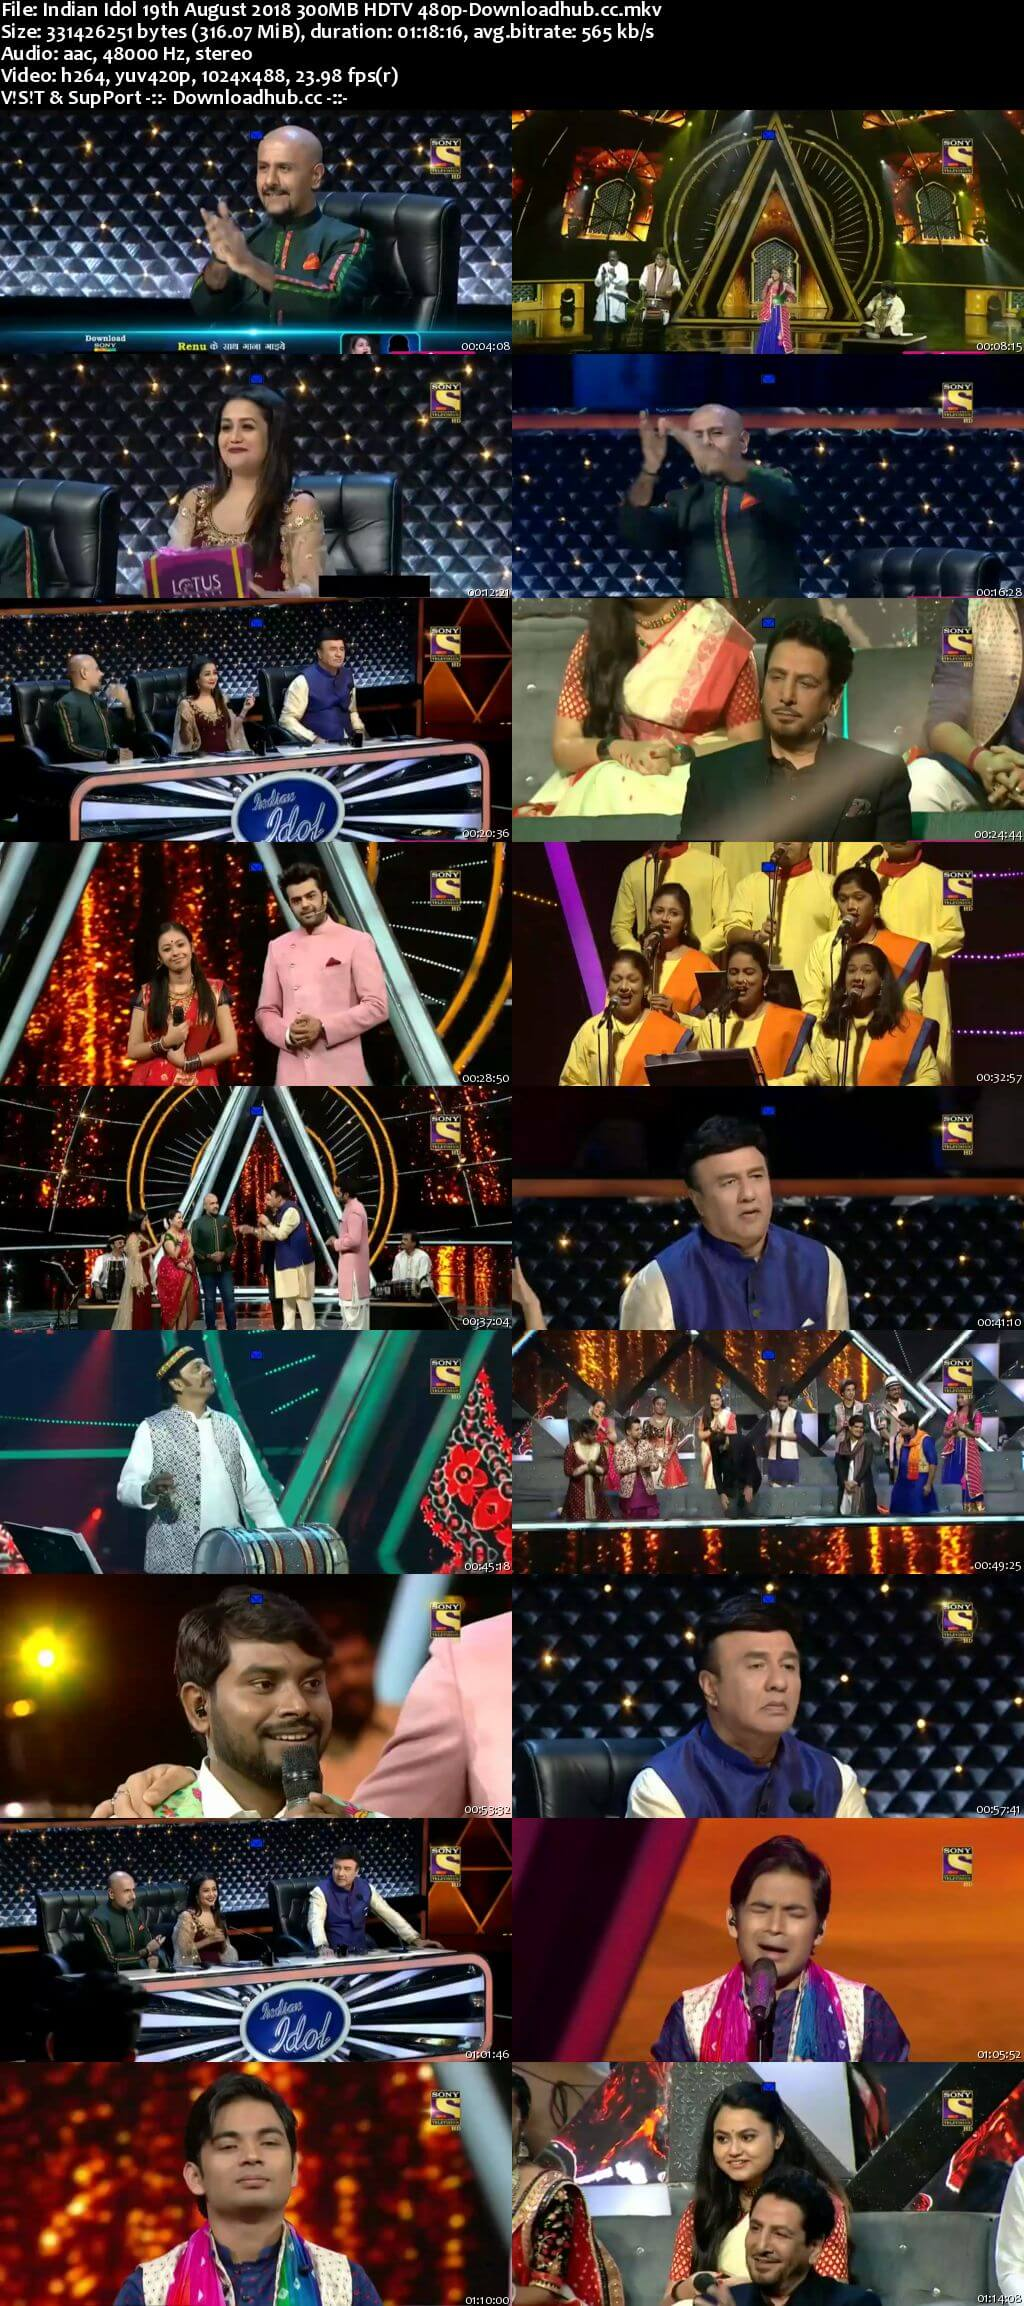 Indian Idol 19 August 2018 Episode 14 HDTV 480p